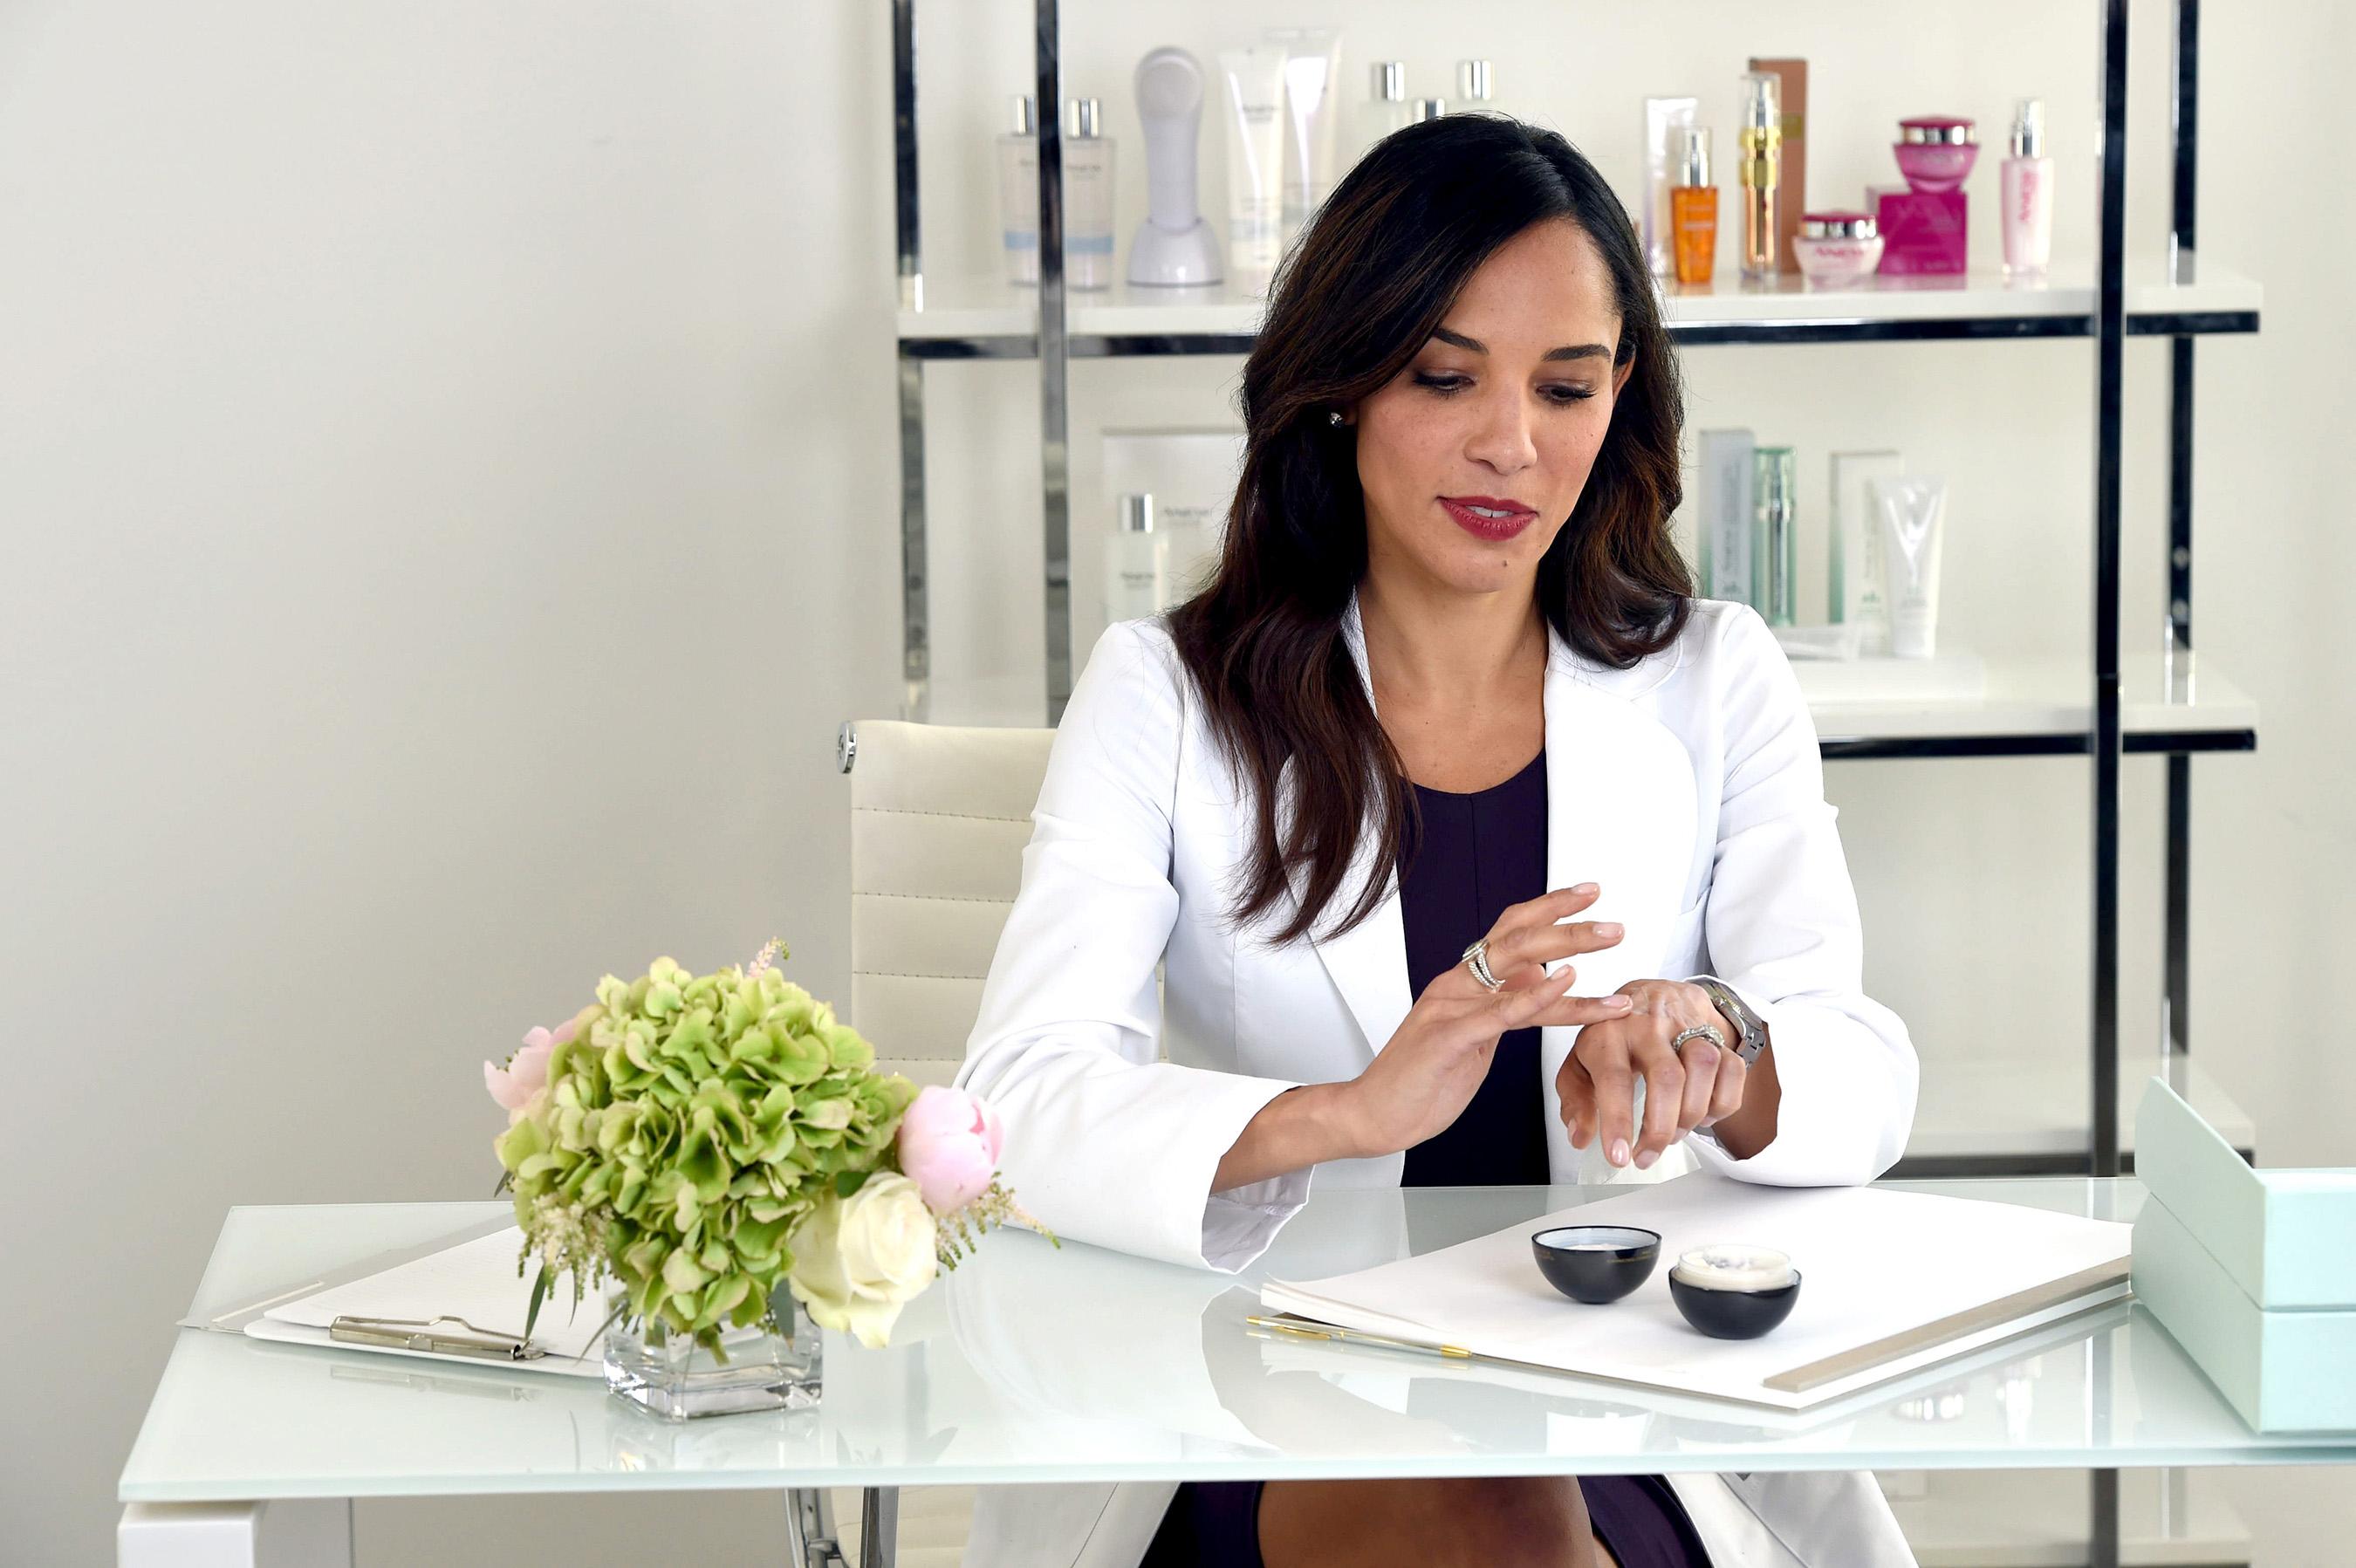 Dr. Nichols testing out Avon ANEW Ultimate Supreme Advanced Performance Crème.